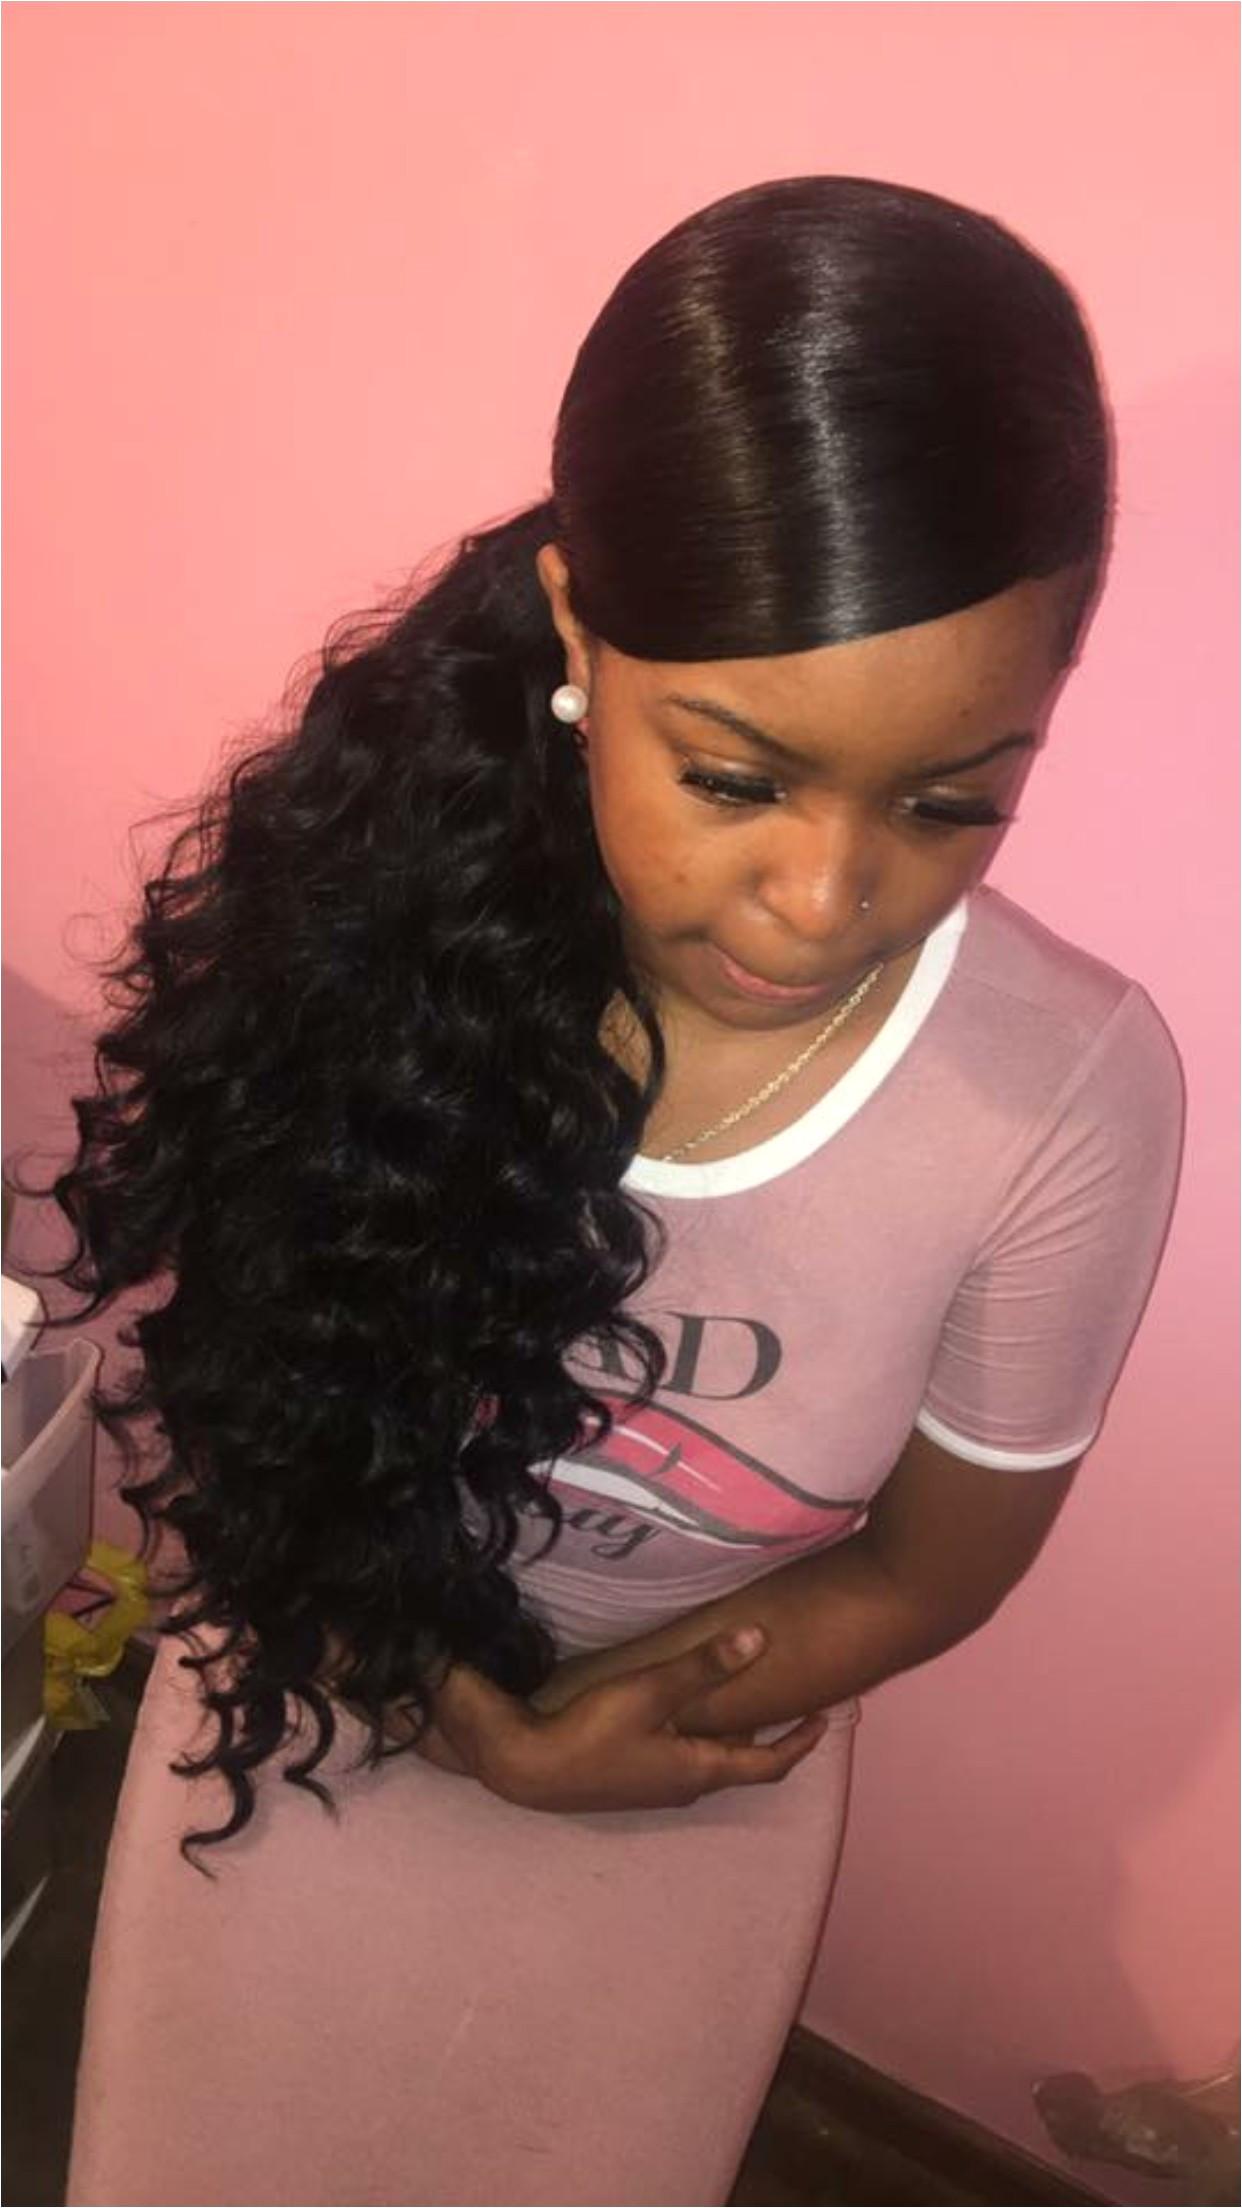 9 Year Old Black Girl Hairstyles Elegant 2 Year Old Black Girl Hairstyles 9 Year